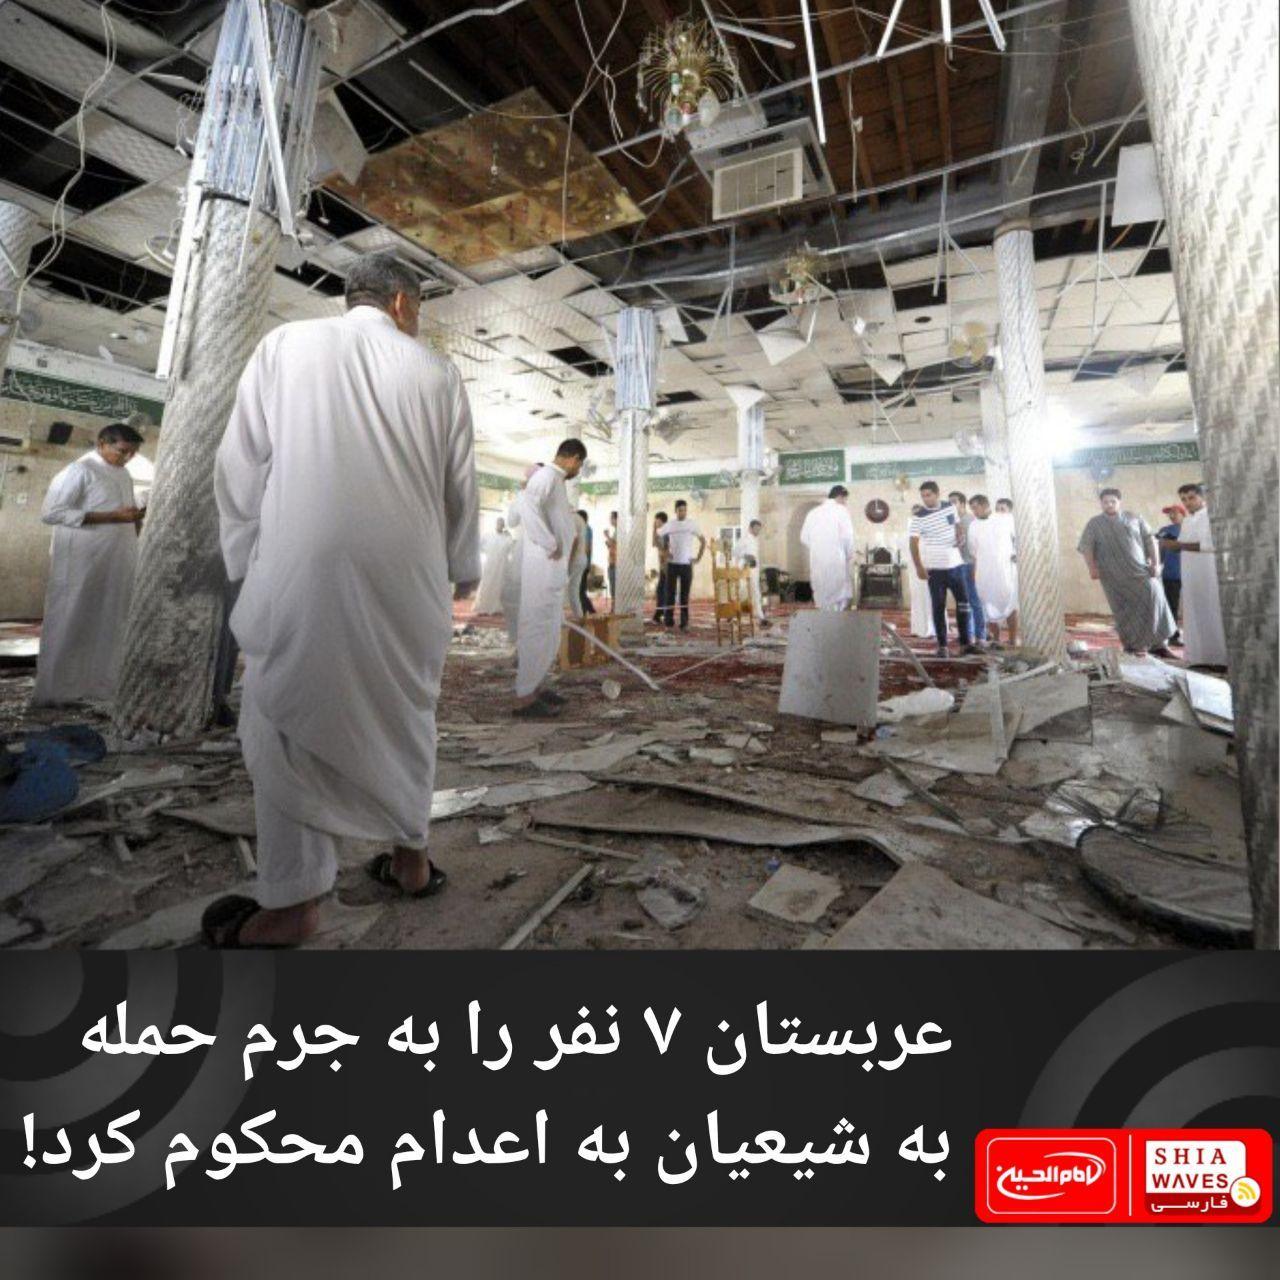 Photo of عربستان ۷ نفر را به جرم حمله به شیعیان به اعدام محکوم کرد!